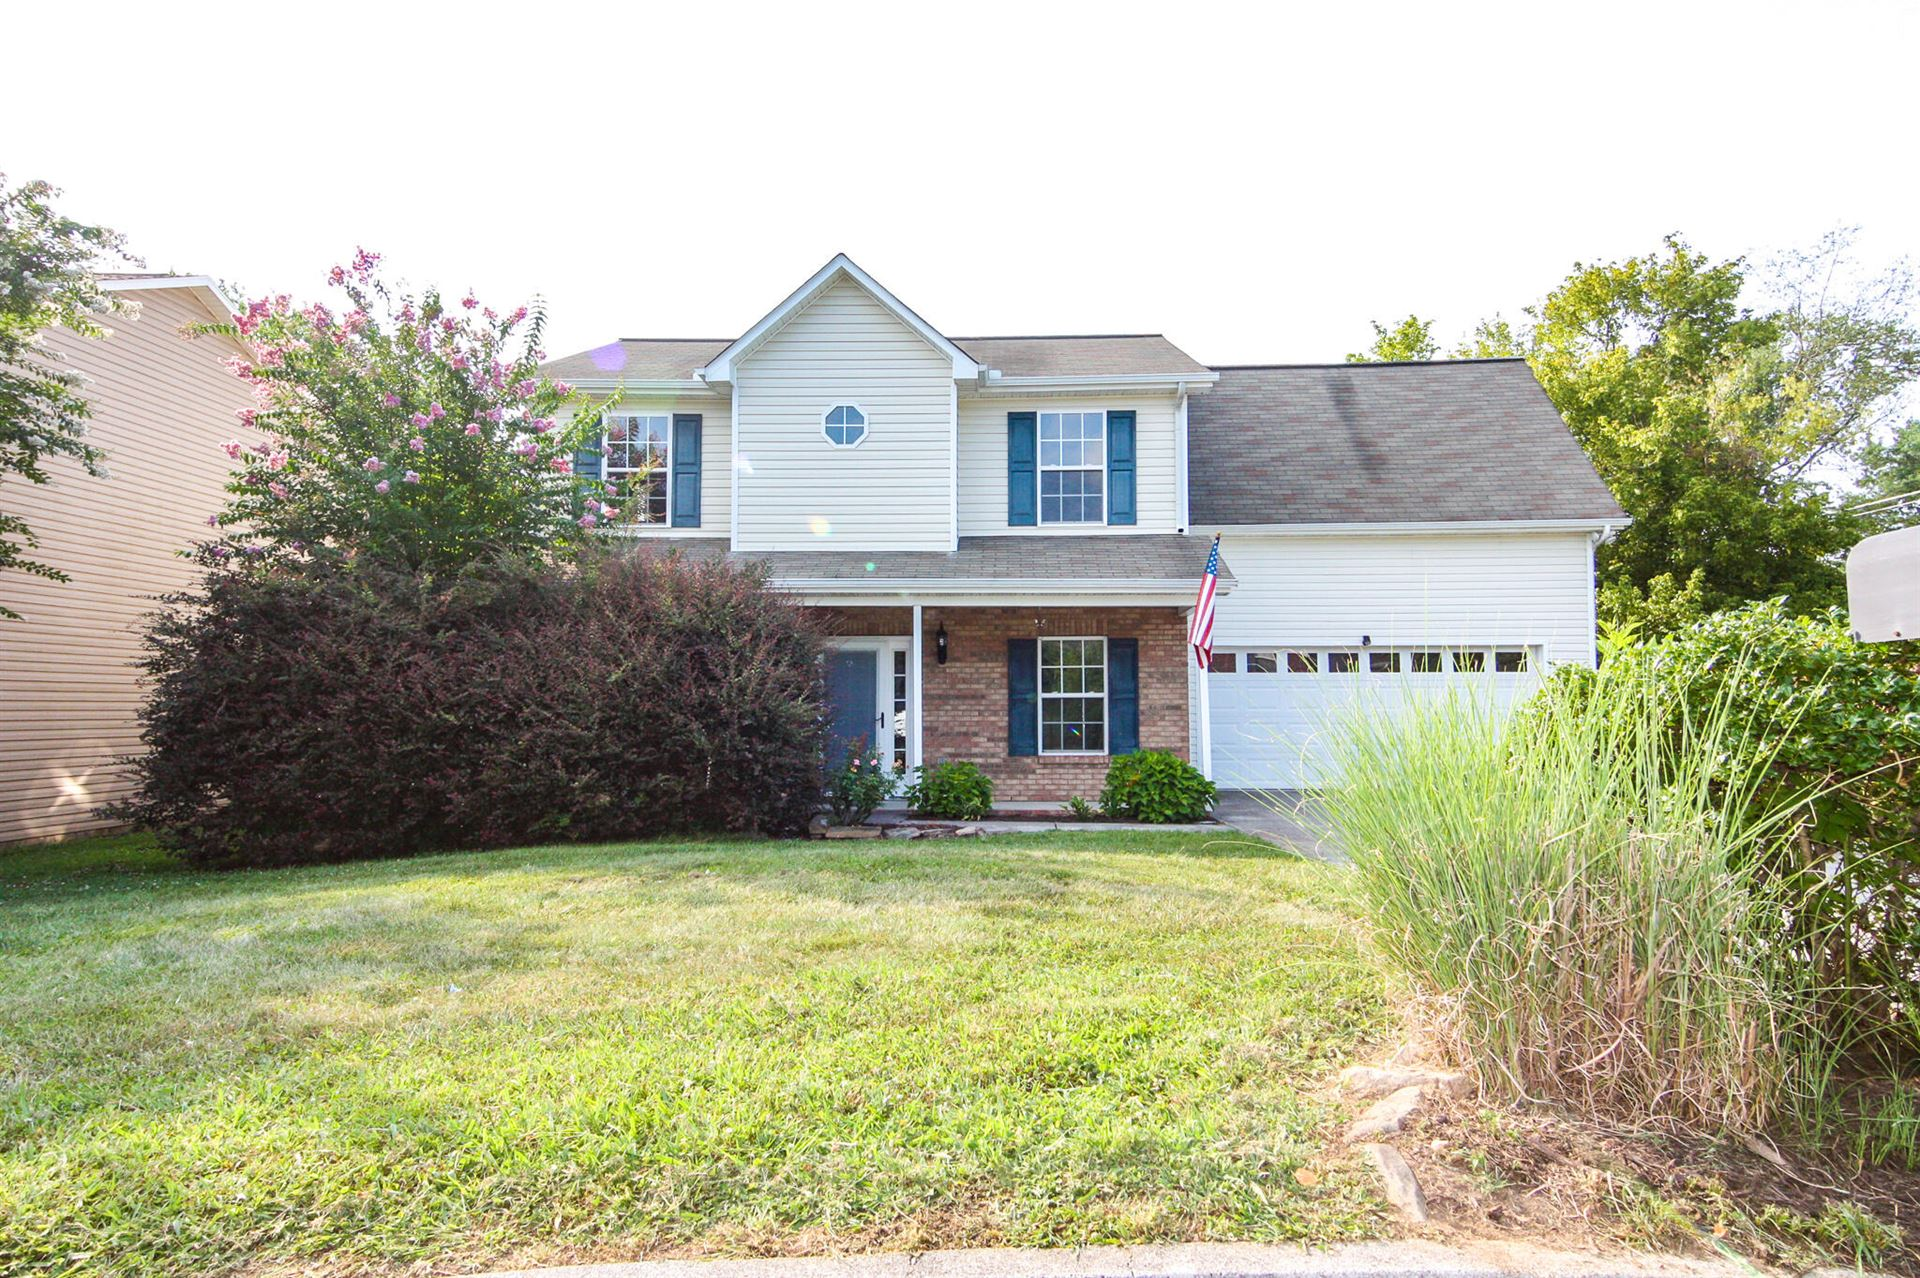 Photo of 7269 Haynesfield Lane, Knoxville, TN 37918 (MLS # 1162291)